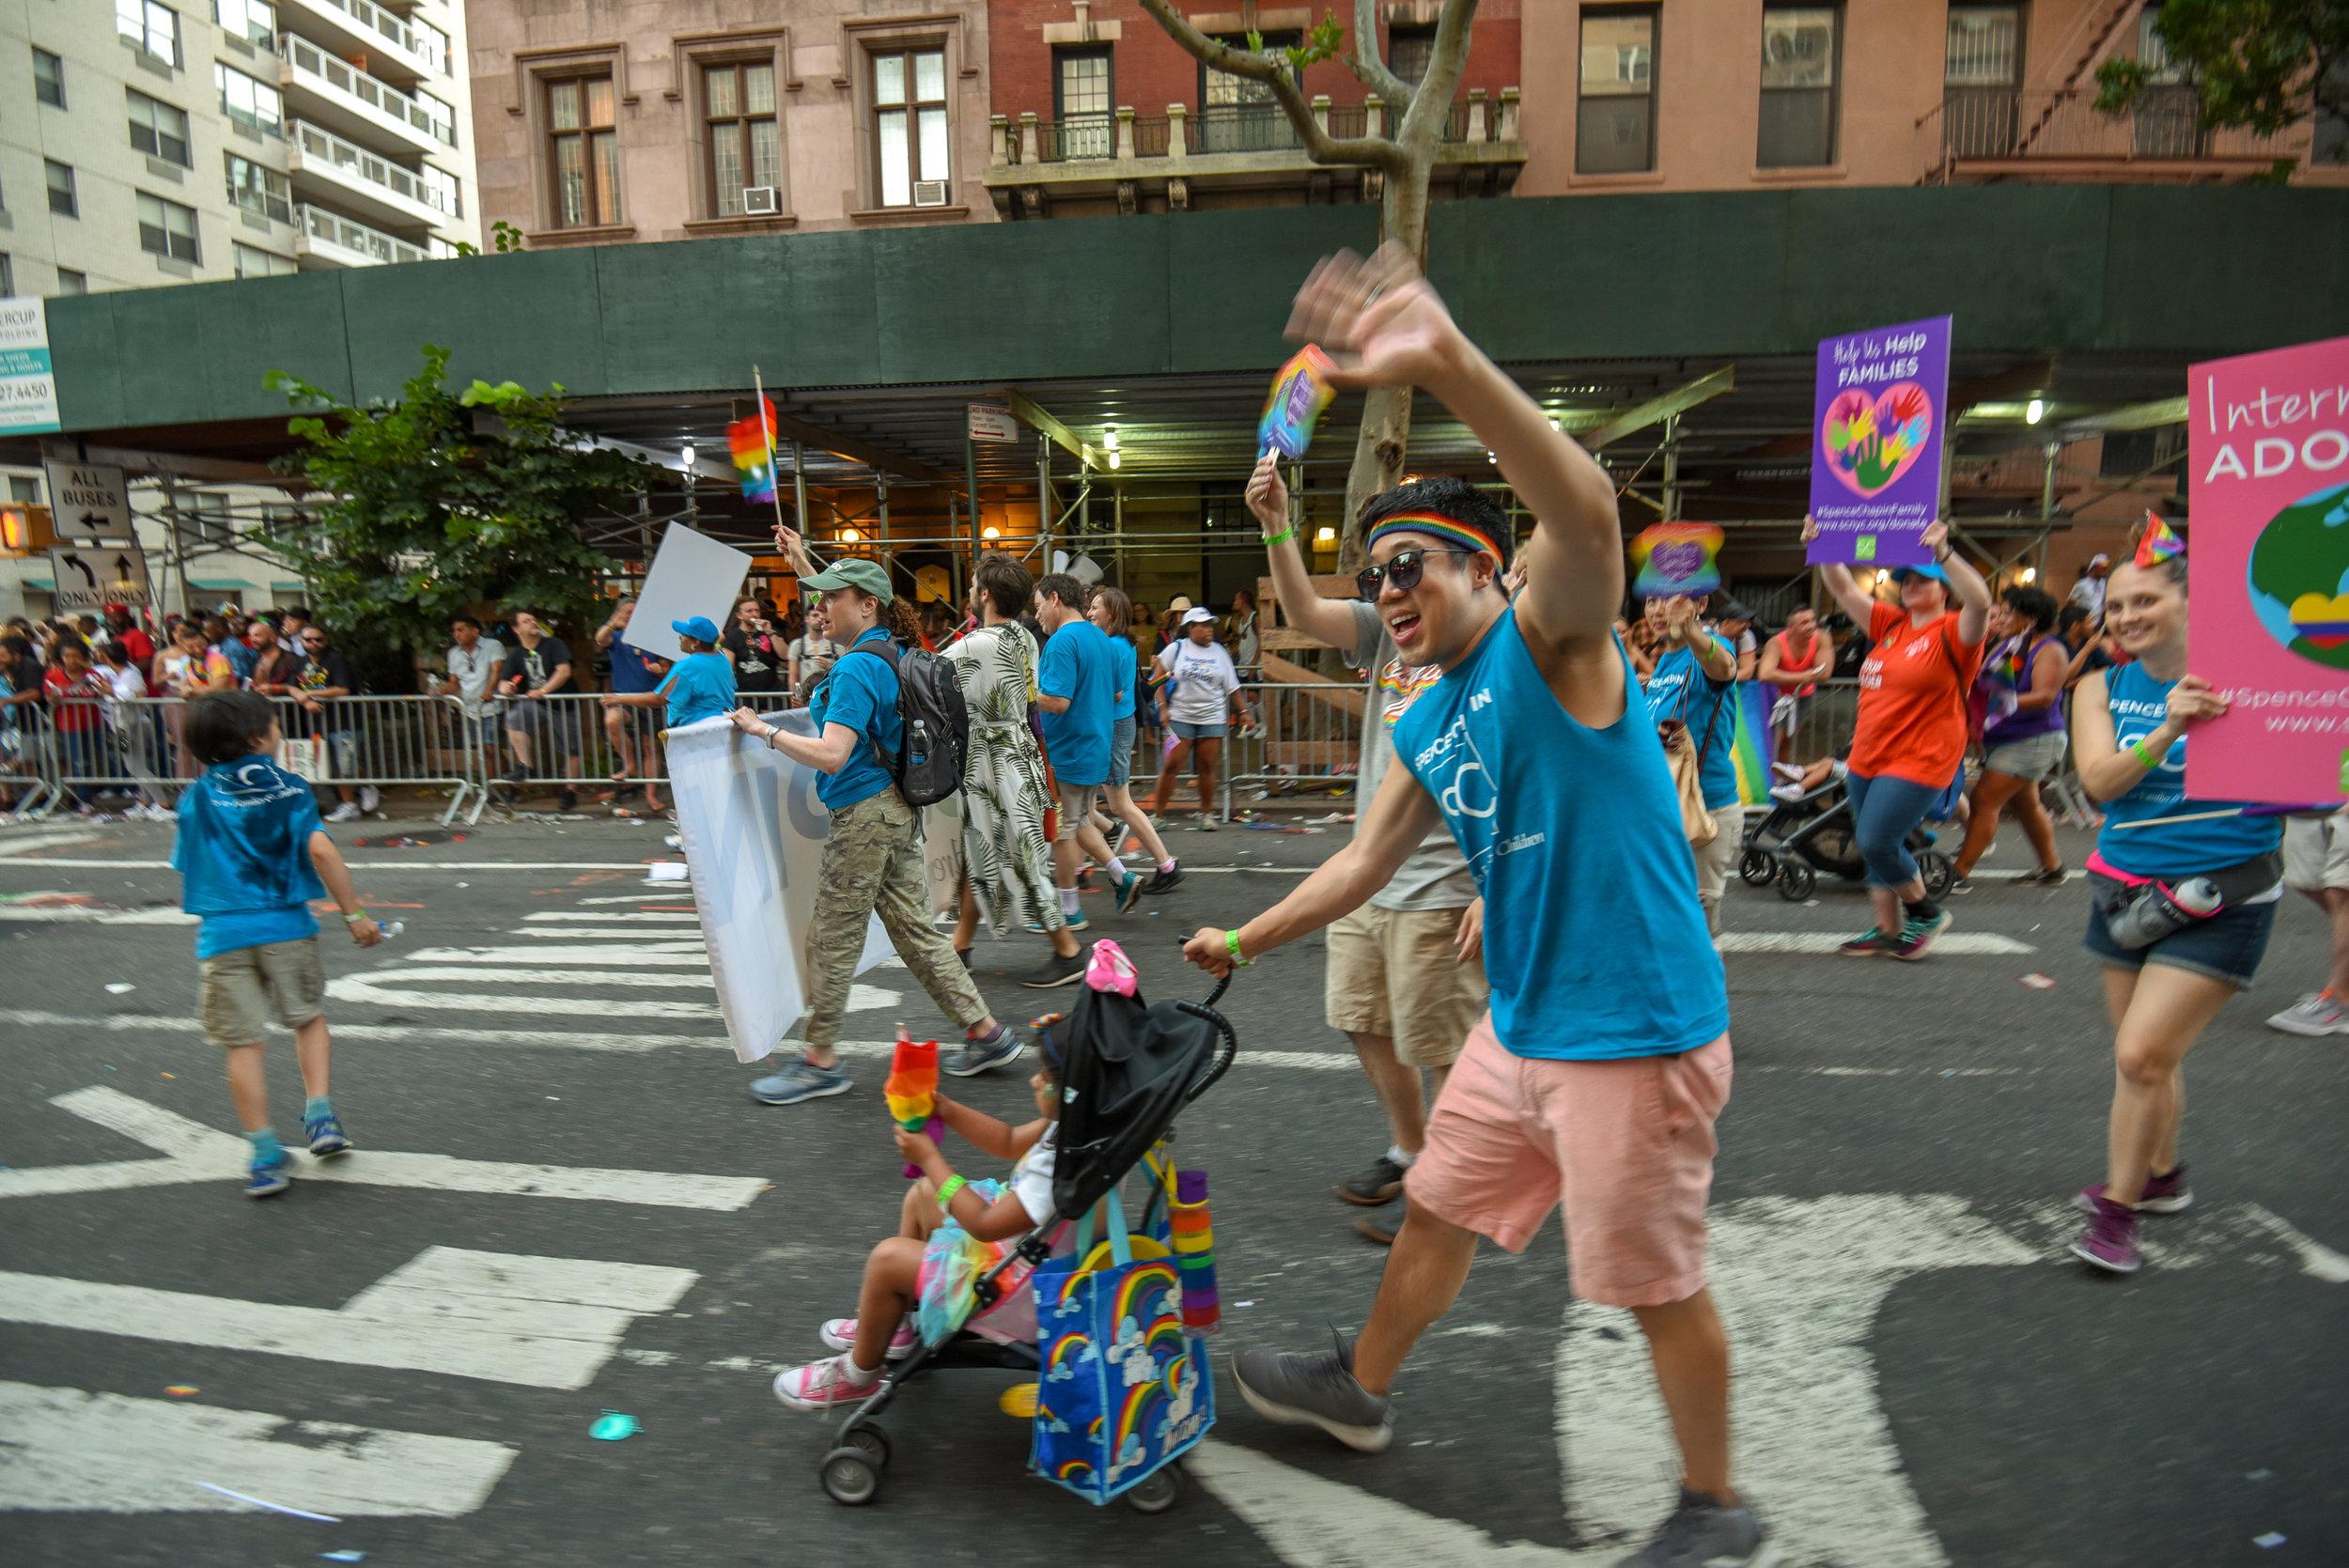 SC-PrideParade-2019_FE-340.jpg